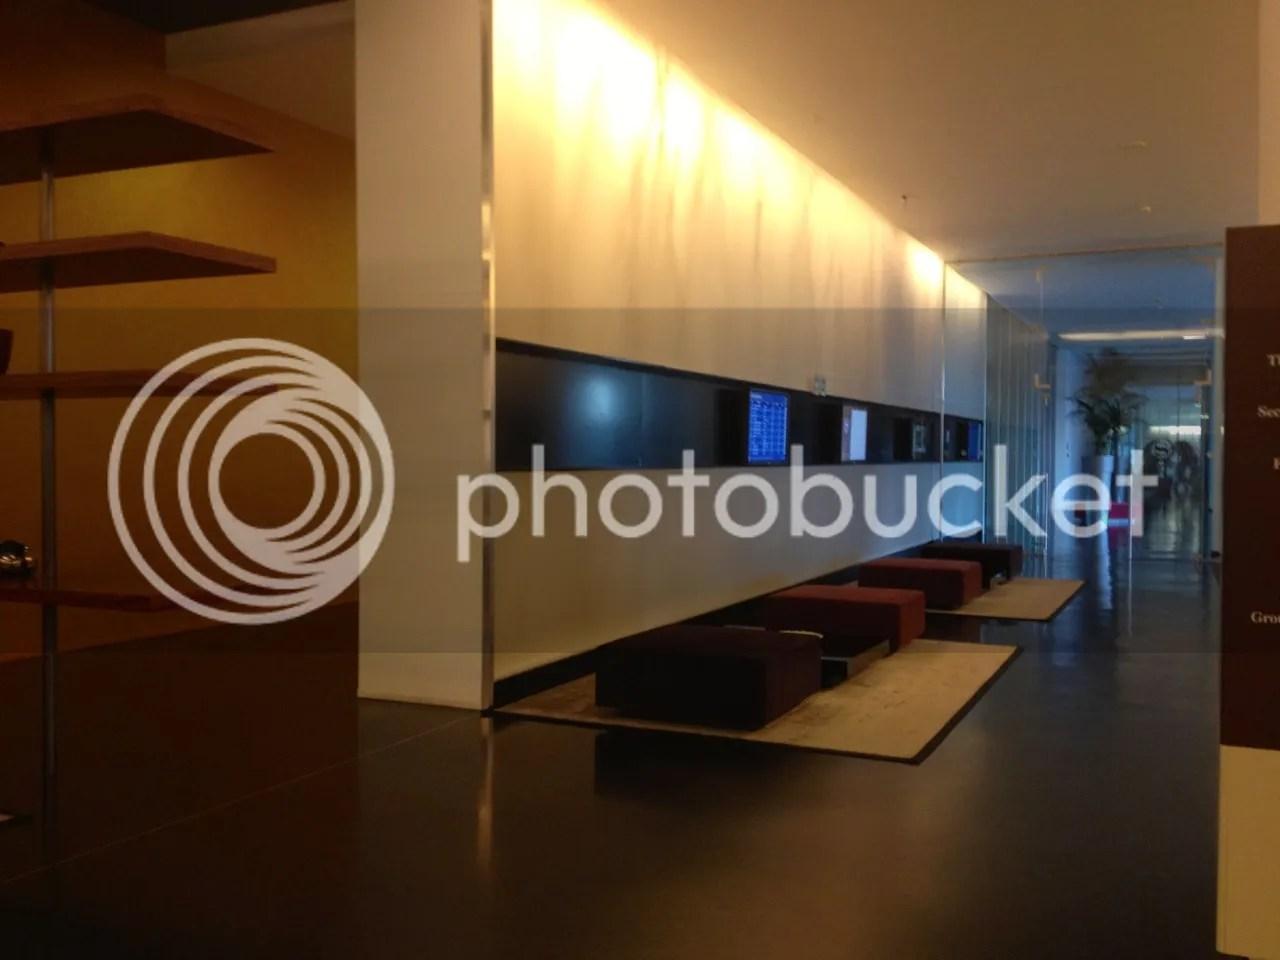 https://i1.wp.com/i181.photobucket.com/albums/x35/jwhite9185/Milan%20Pt2/file-3.jpg